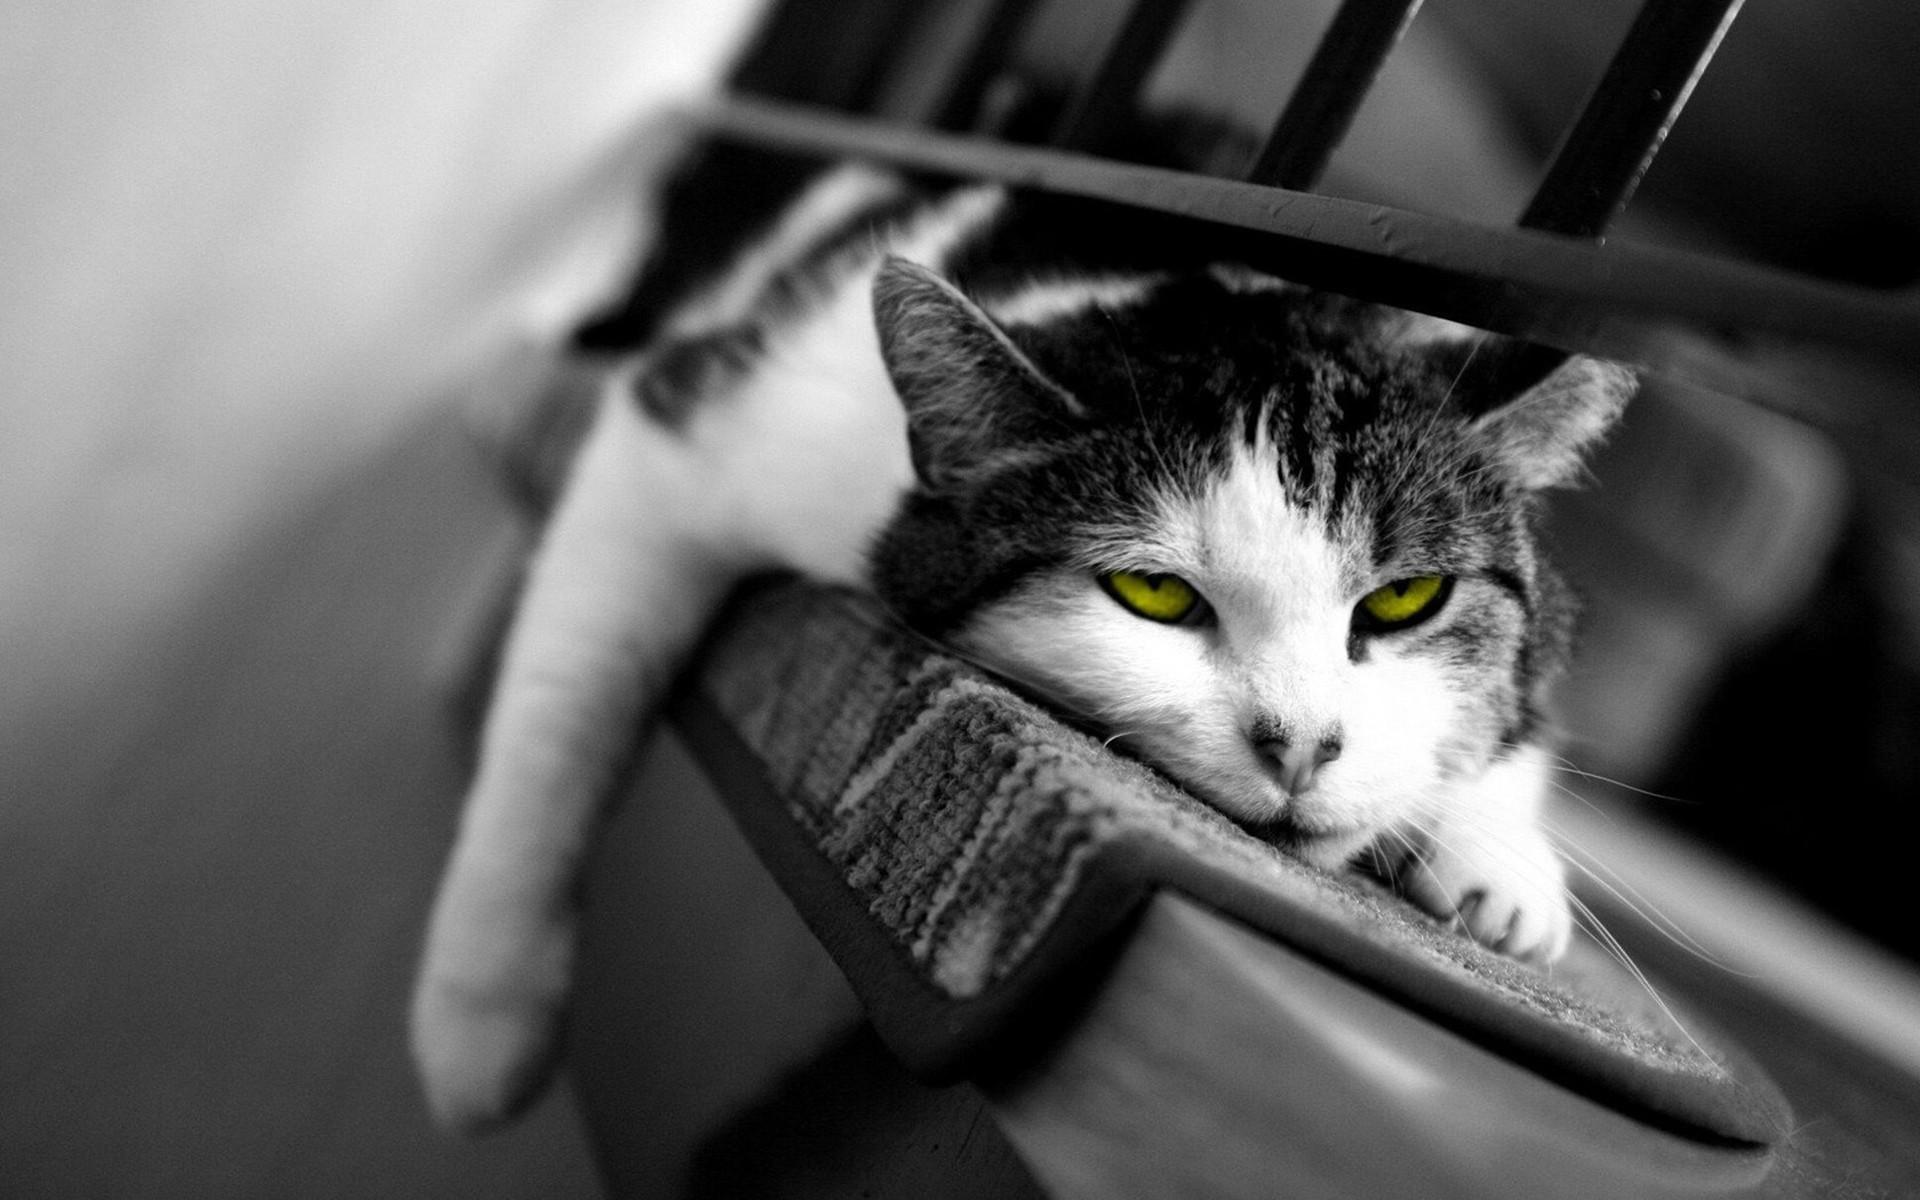 Cat Black And White Hd Widescreen Desktop Wallpaper